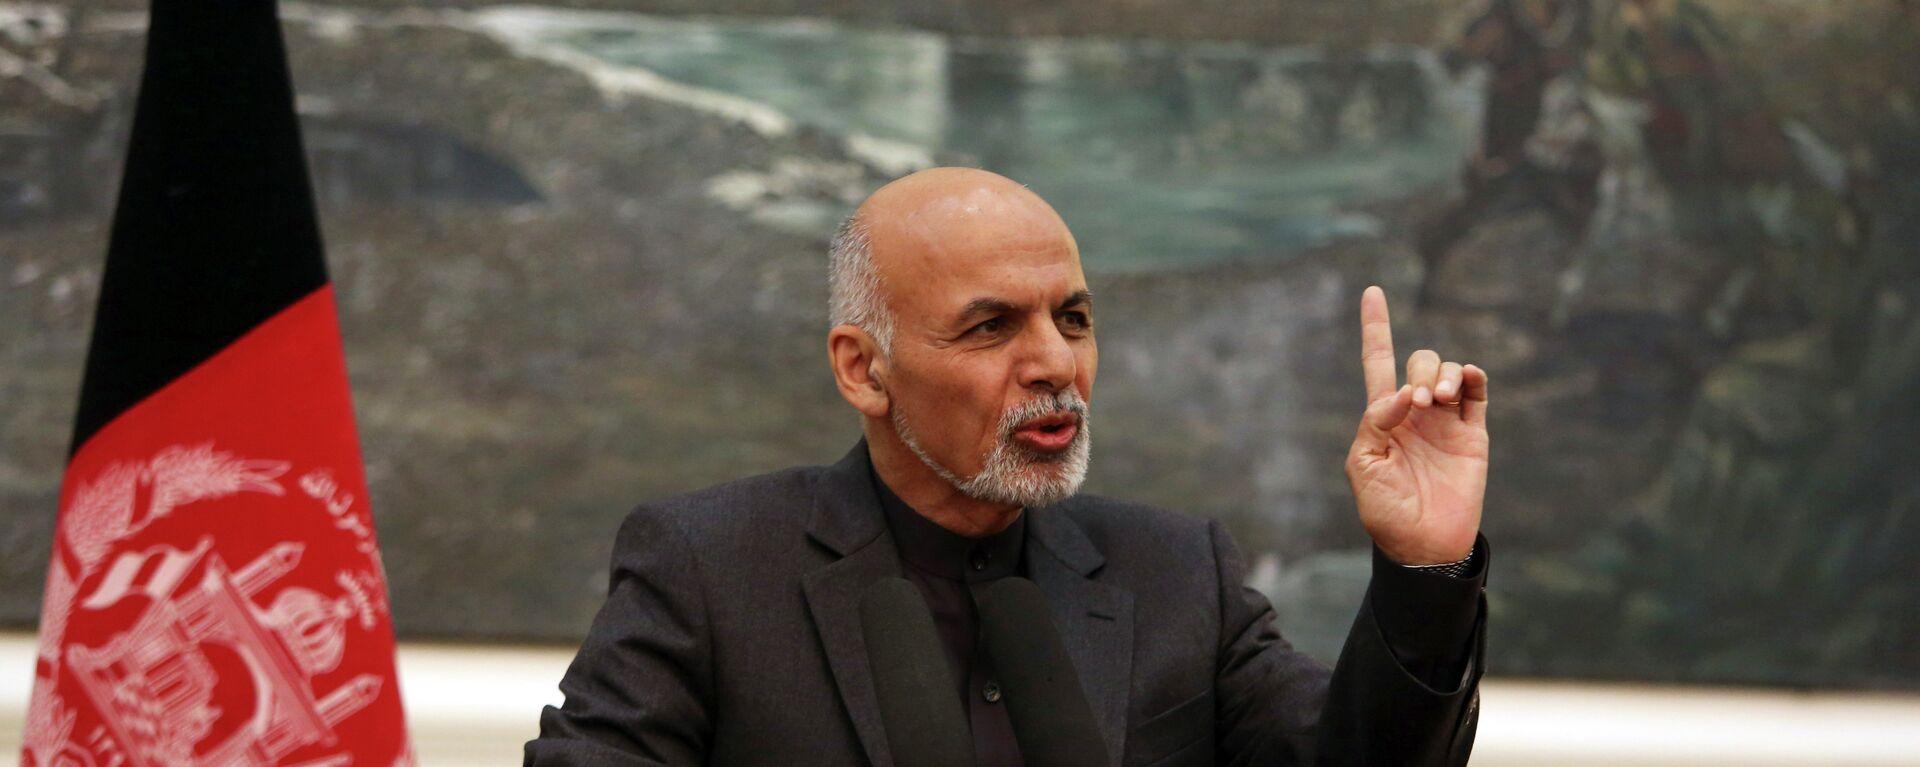 El expresidente afgano, Ashraf Ghani - Sputnik Mundo, 1920, 27.09.2021